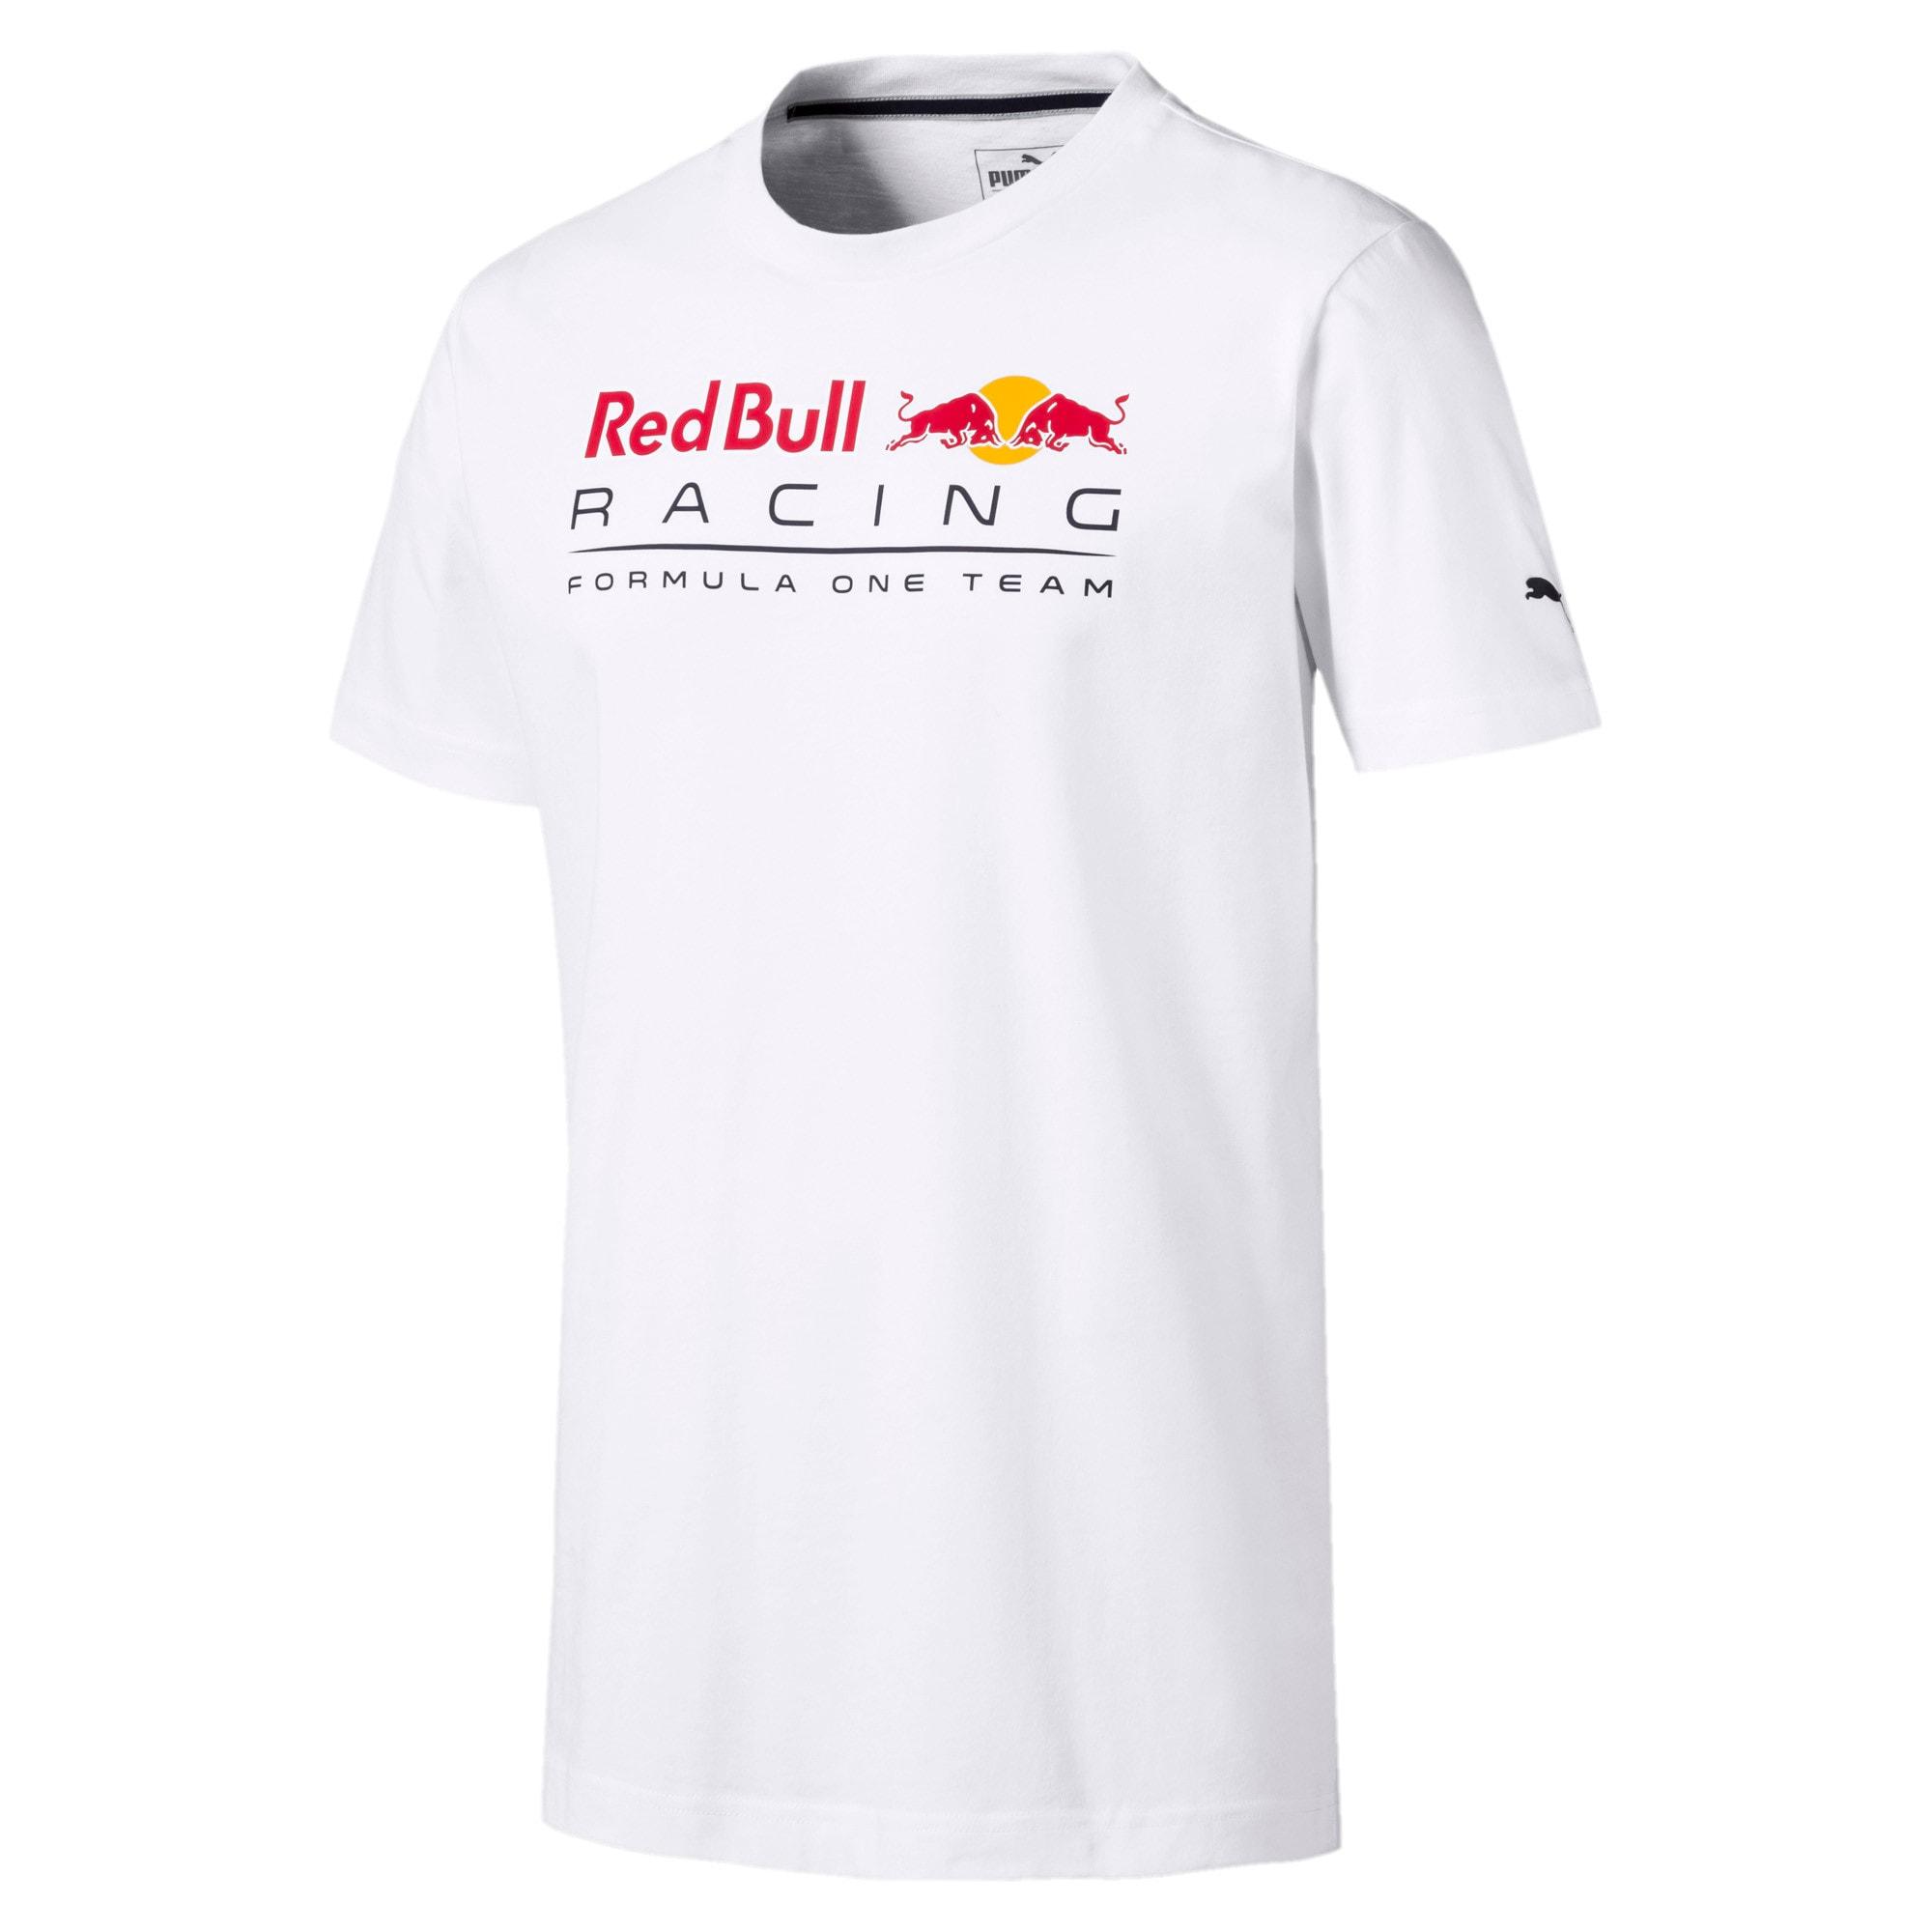 Thumbnail 4 of Maglietta con logo Red Bull Racing uomo, Puma White, medium